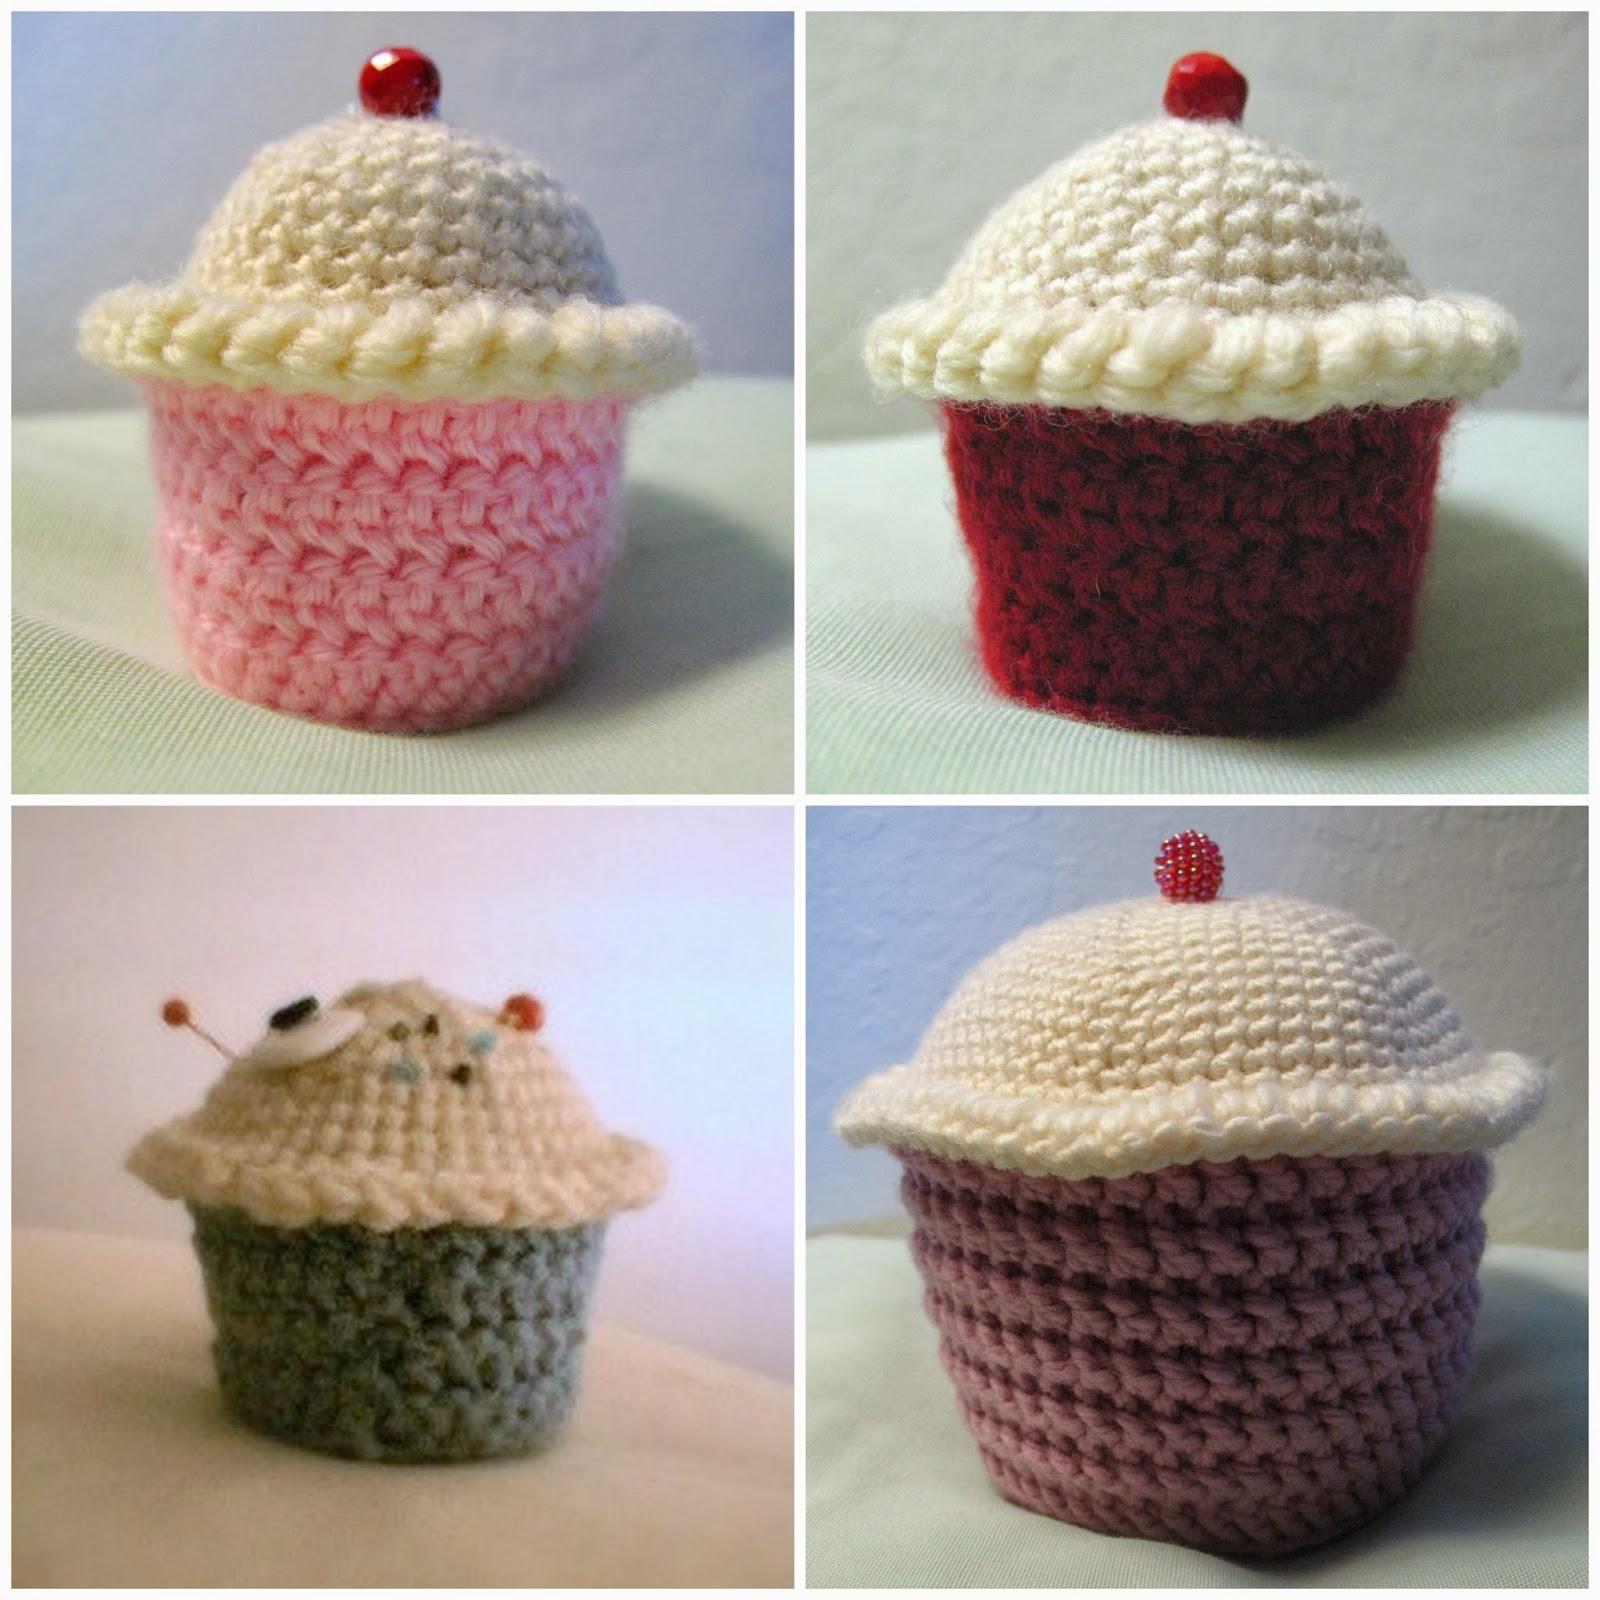 Amigurumi Yarn Michaels : Oh the Cuteness!: Free Crochet and Knitting Patterns